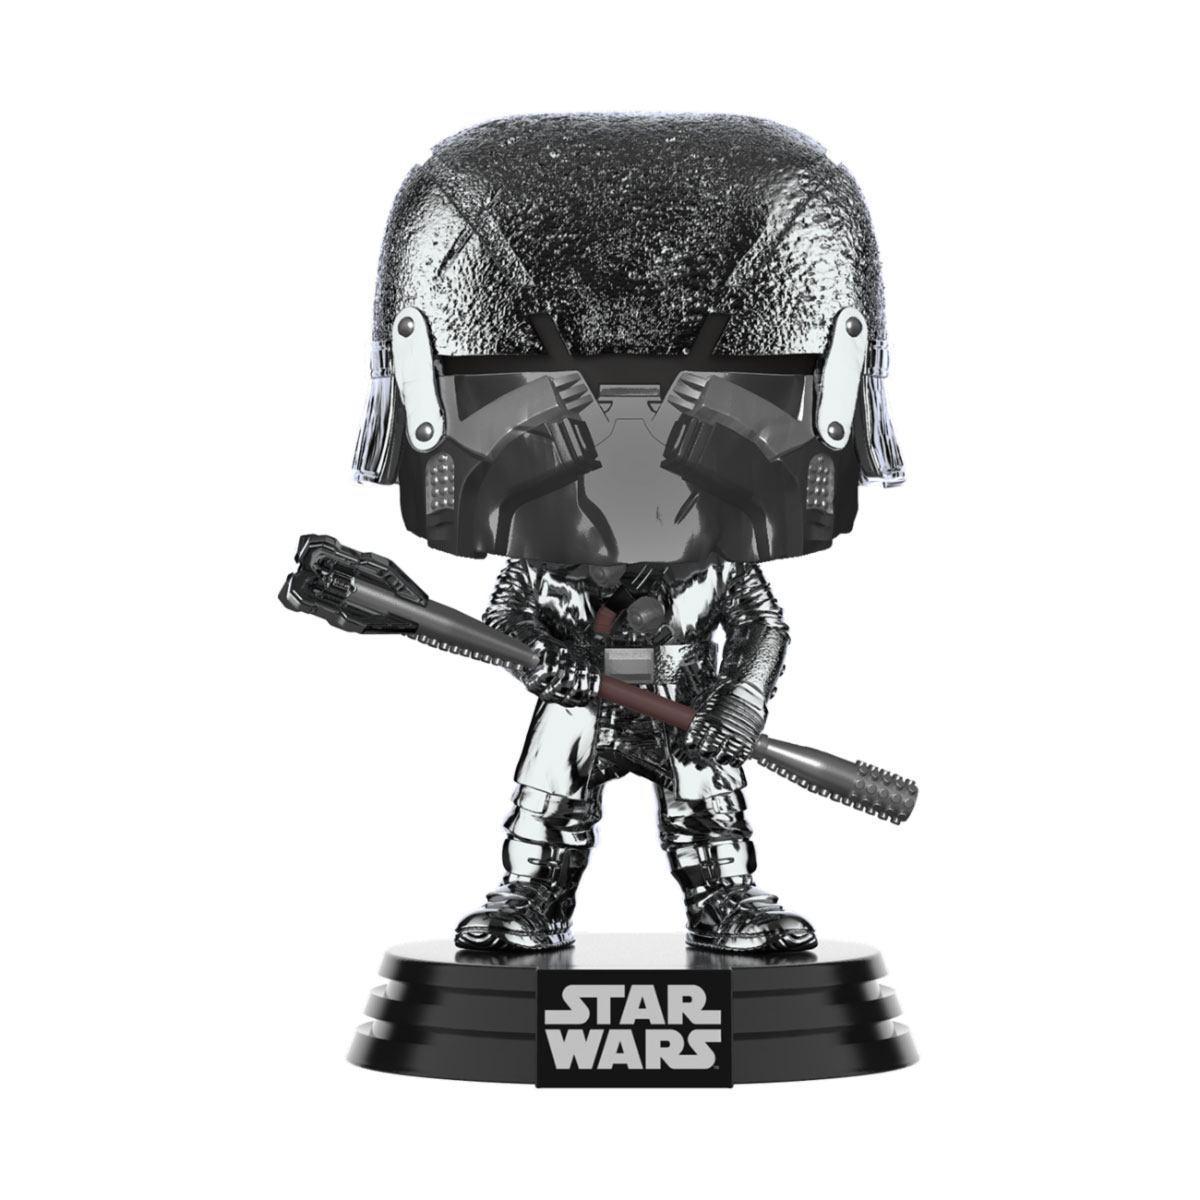 Star Wars POP! Movies Vinyl Figure KOR Club (Chrome) 9 cm